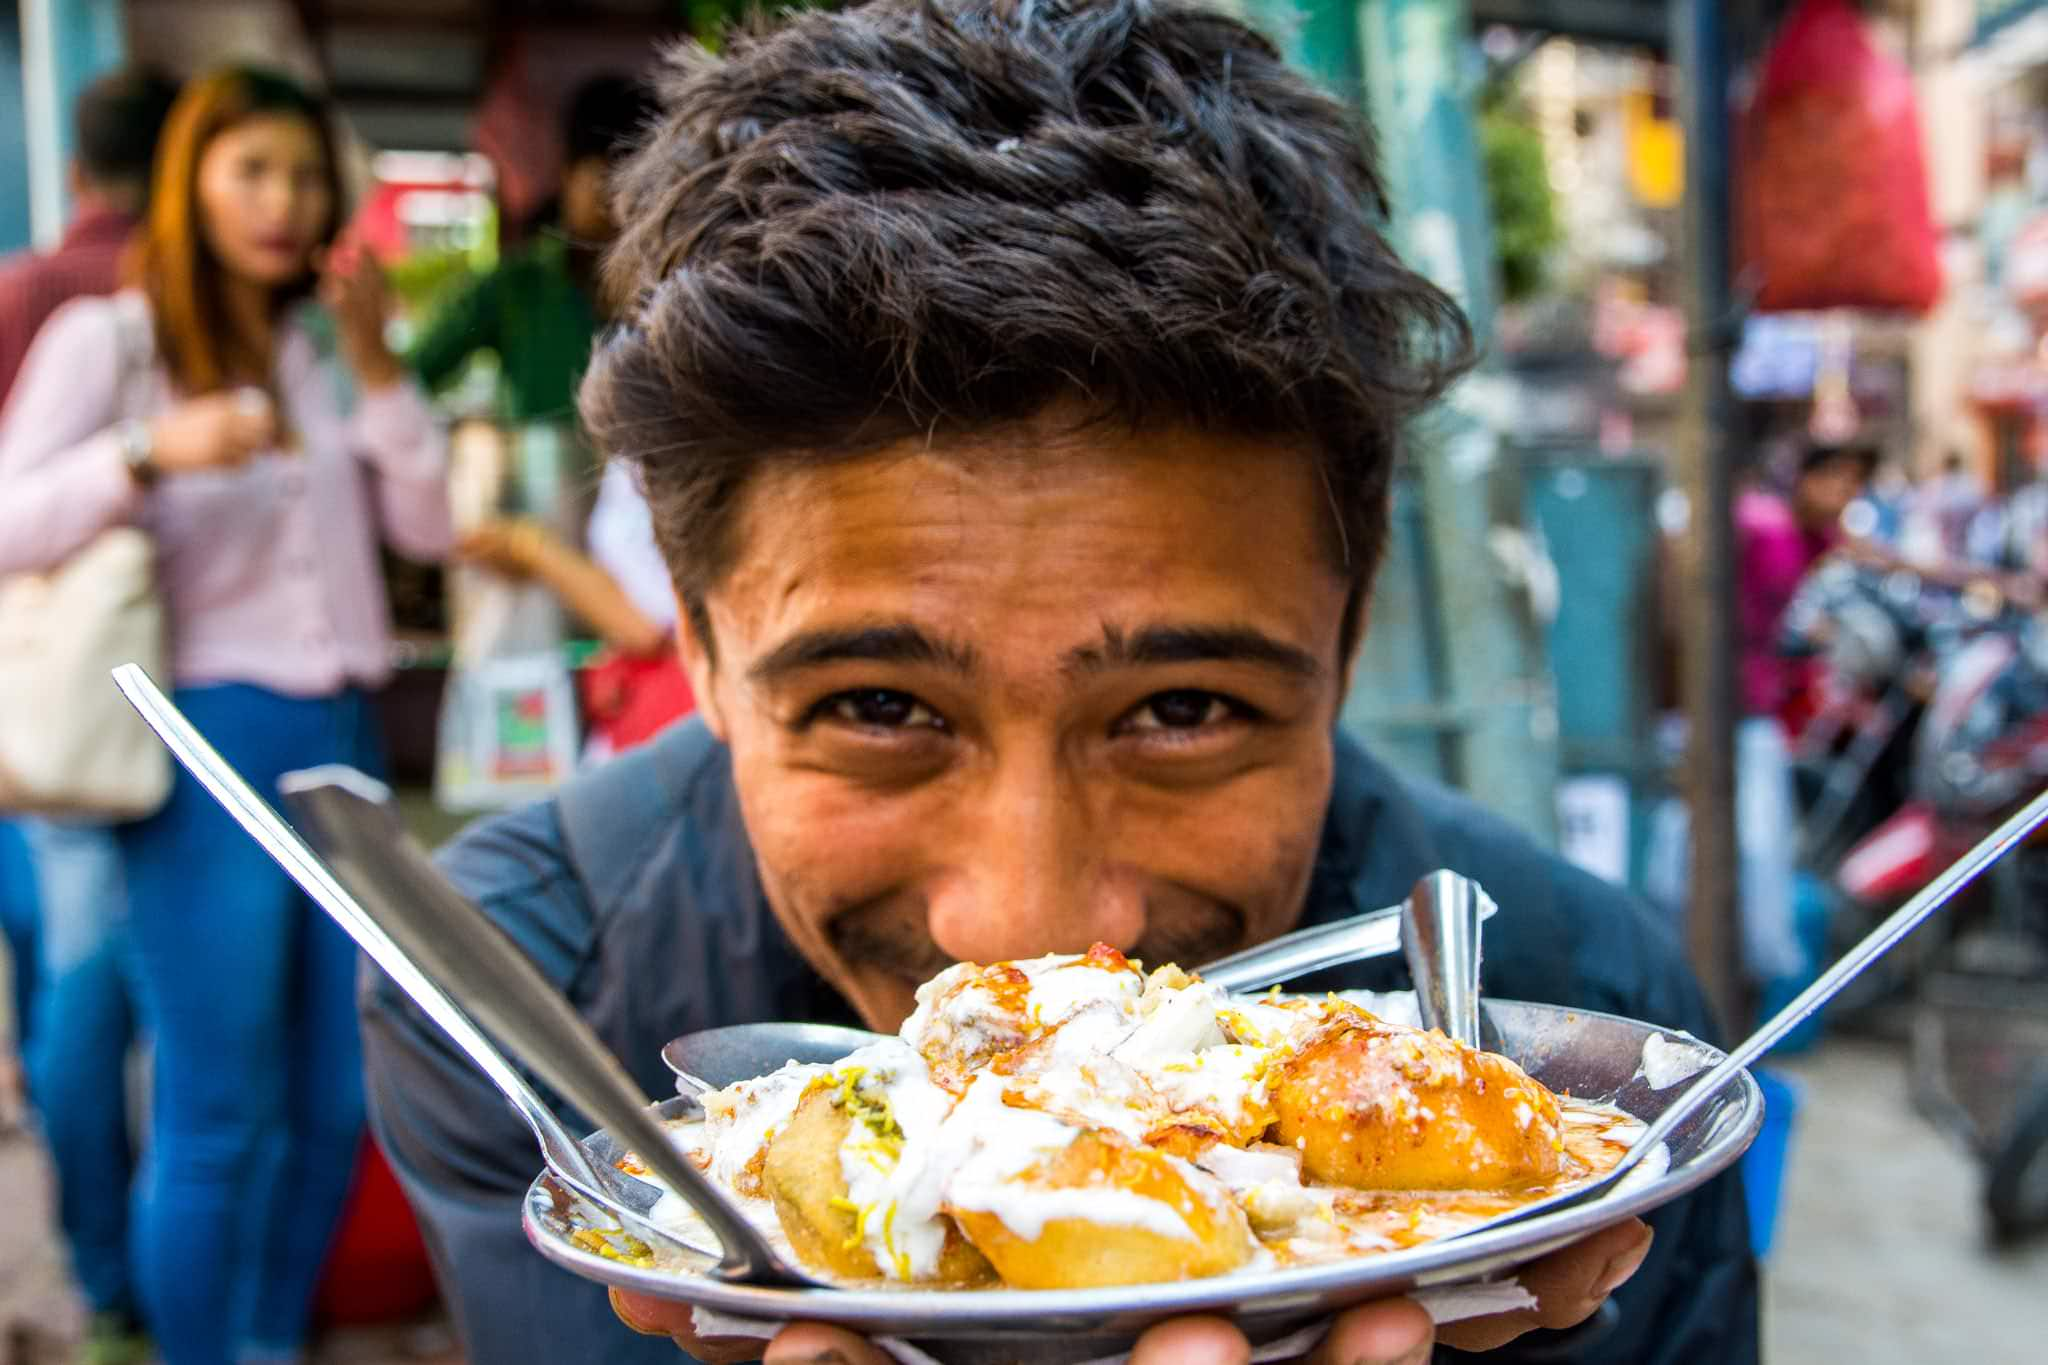 Our Kathmandu food tour guide from Backstreet Academy